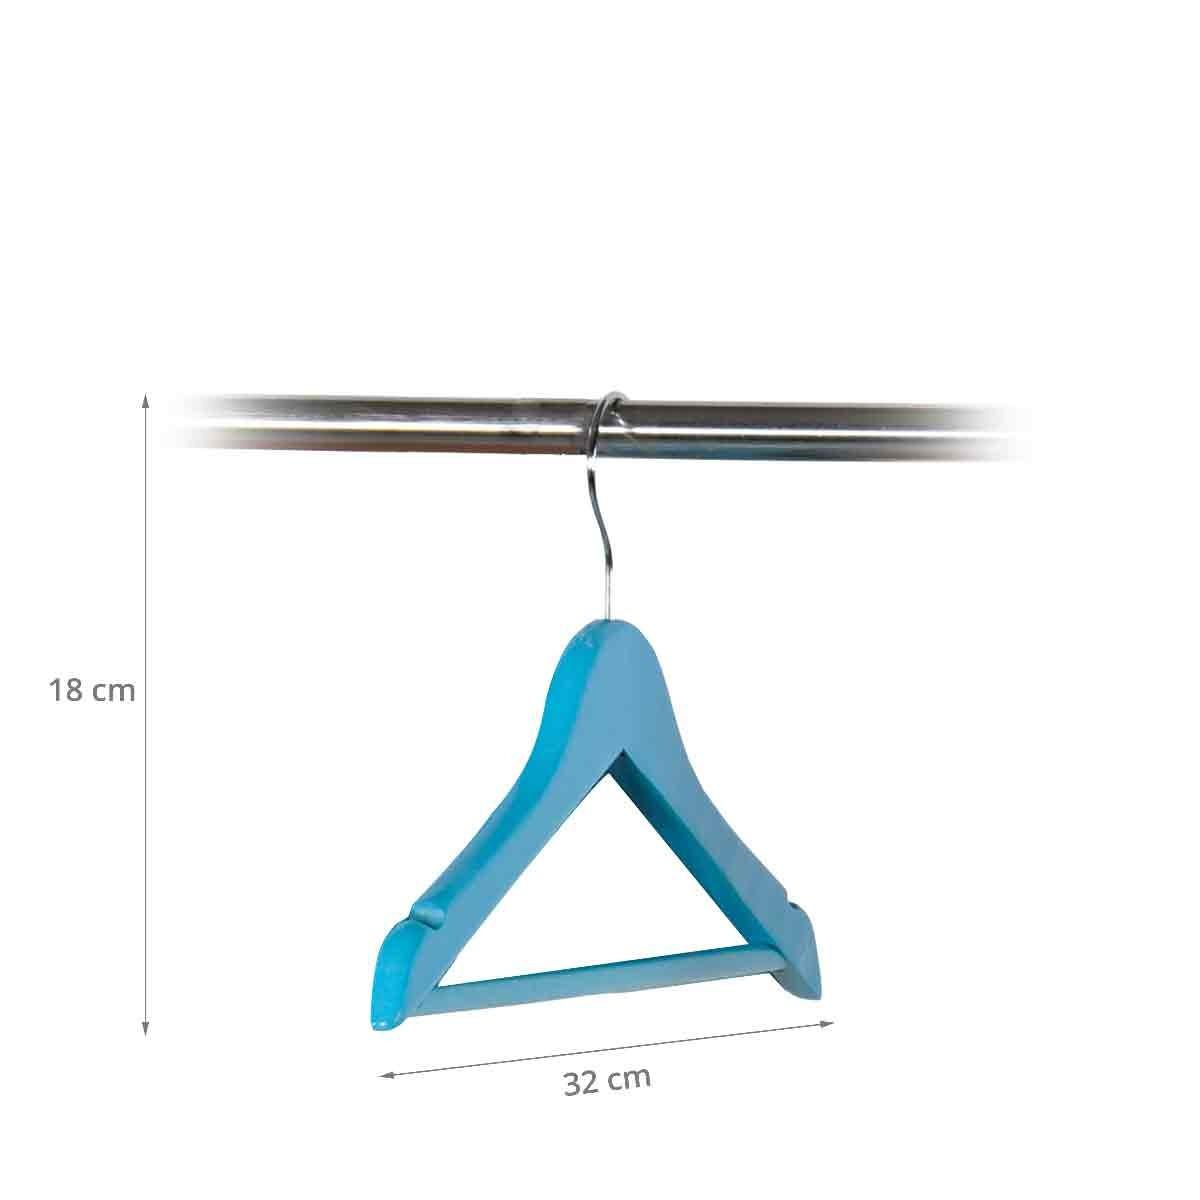 cintre pour enfant en bois bleu rangement v tements. Black Bedroom Furniture Sets. Home Design Ideas